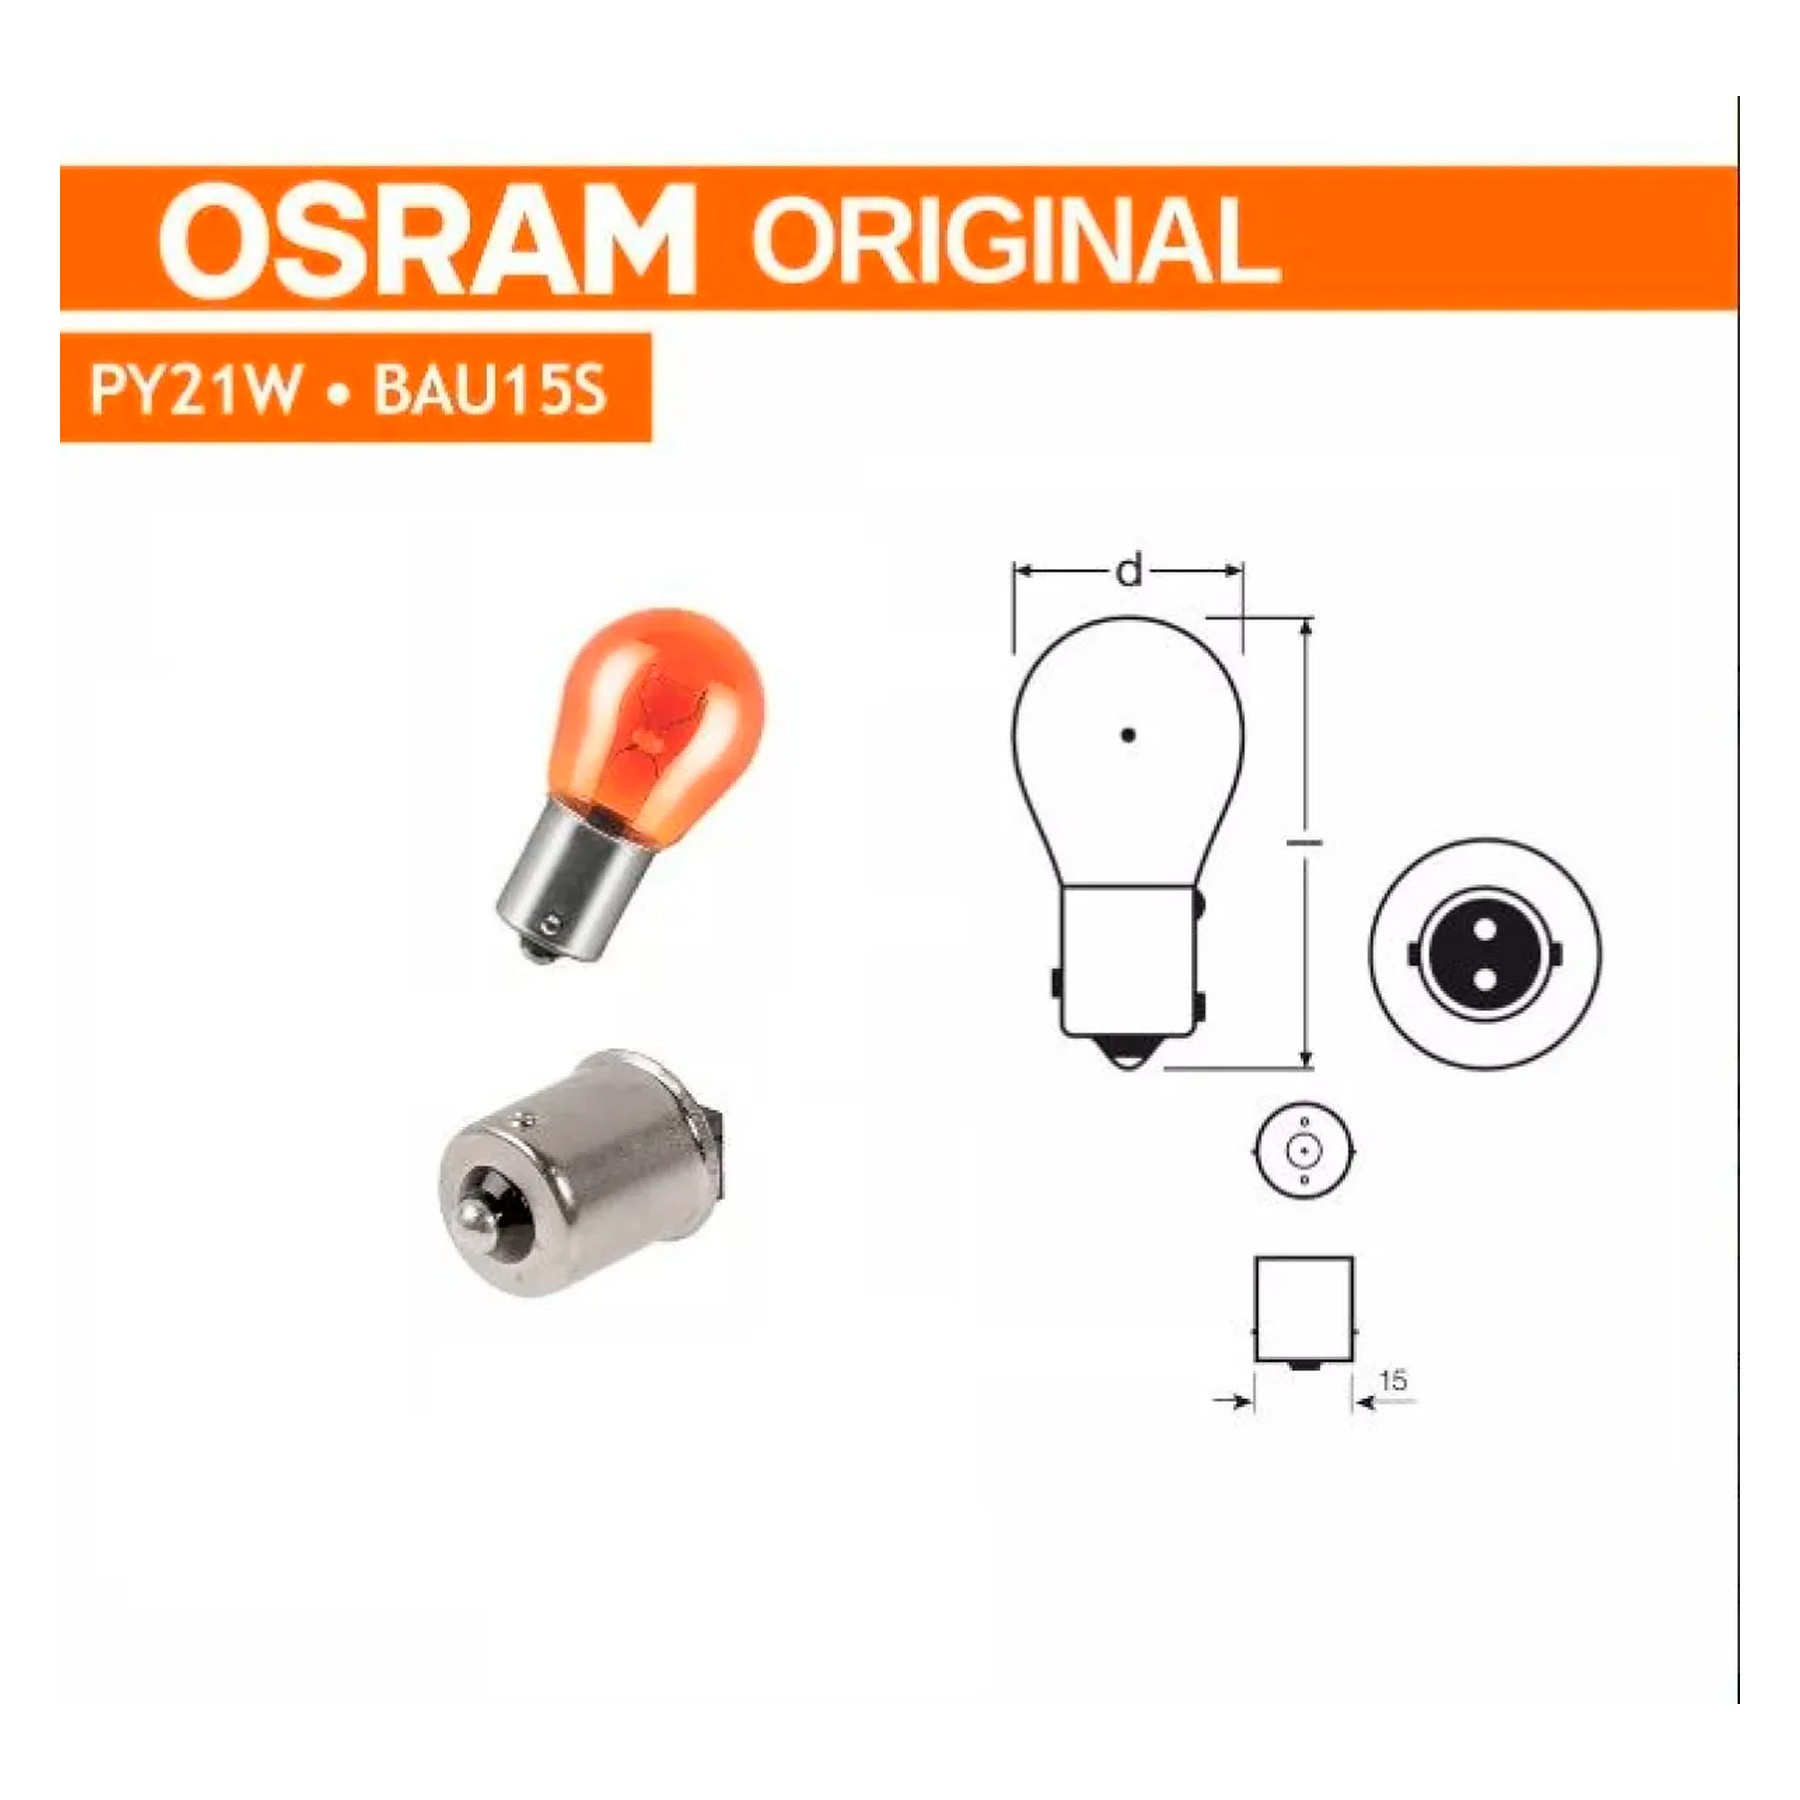 Lampada Miniatura PY21W Lanterna Ambar 21Watt 12Volts (1 Polo) Osram